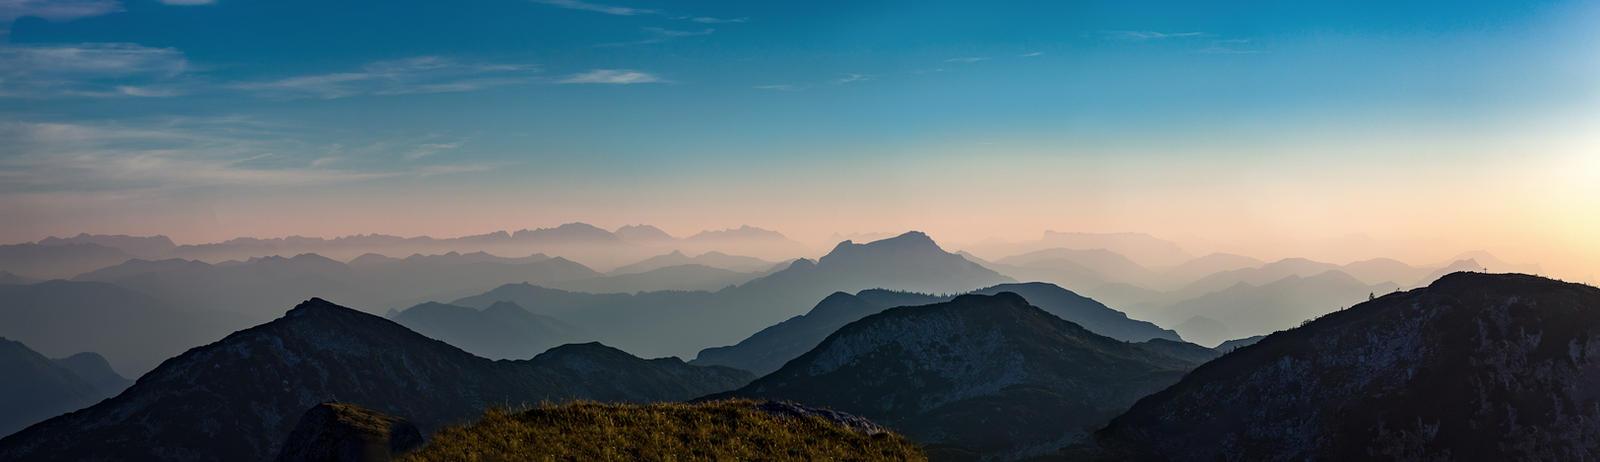 Background mountains brunnkogel blue